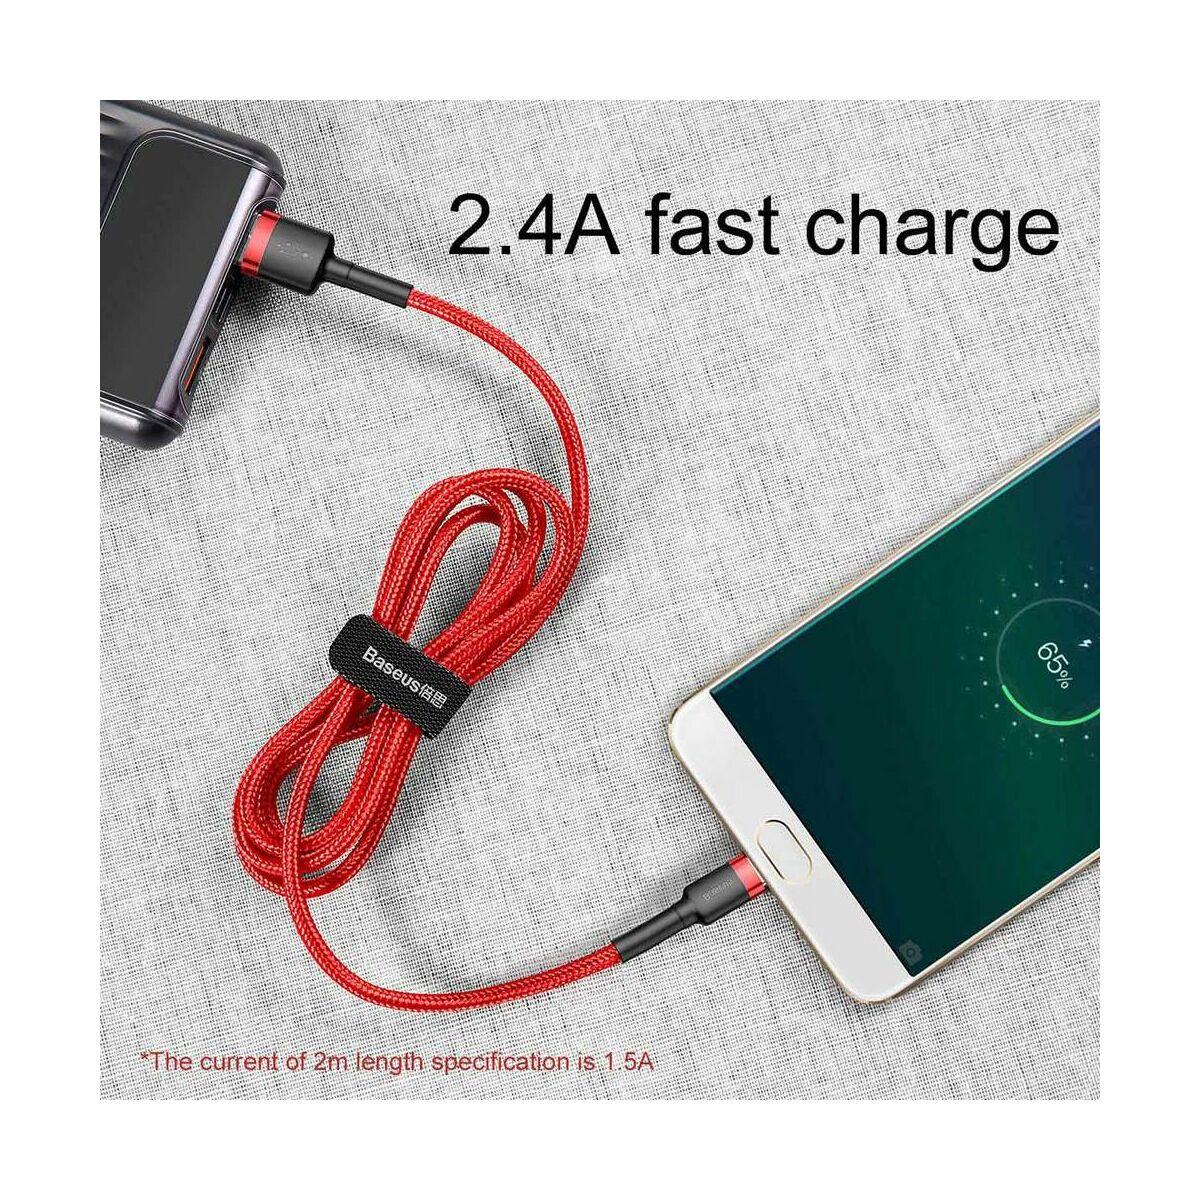 Baseus Micro USB kábel, Cafule 1.5A, 2m, piros/piros (CAMKLF-C09)